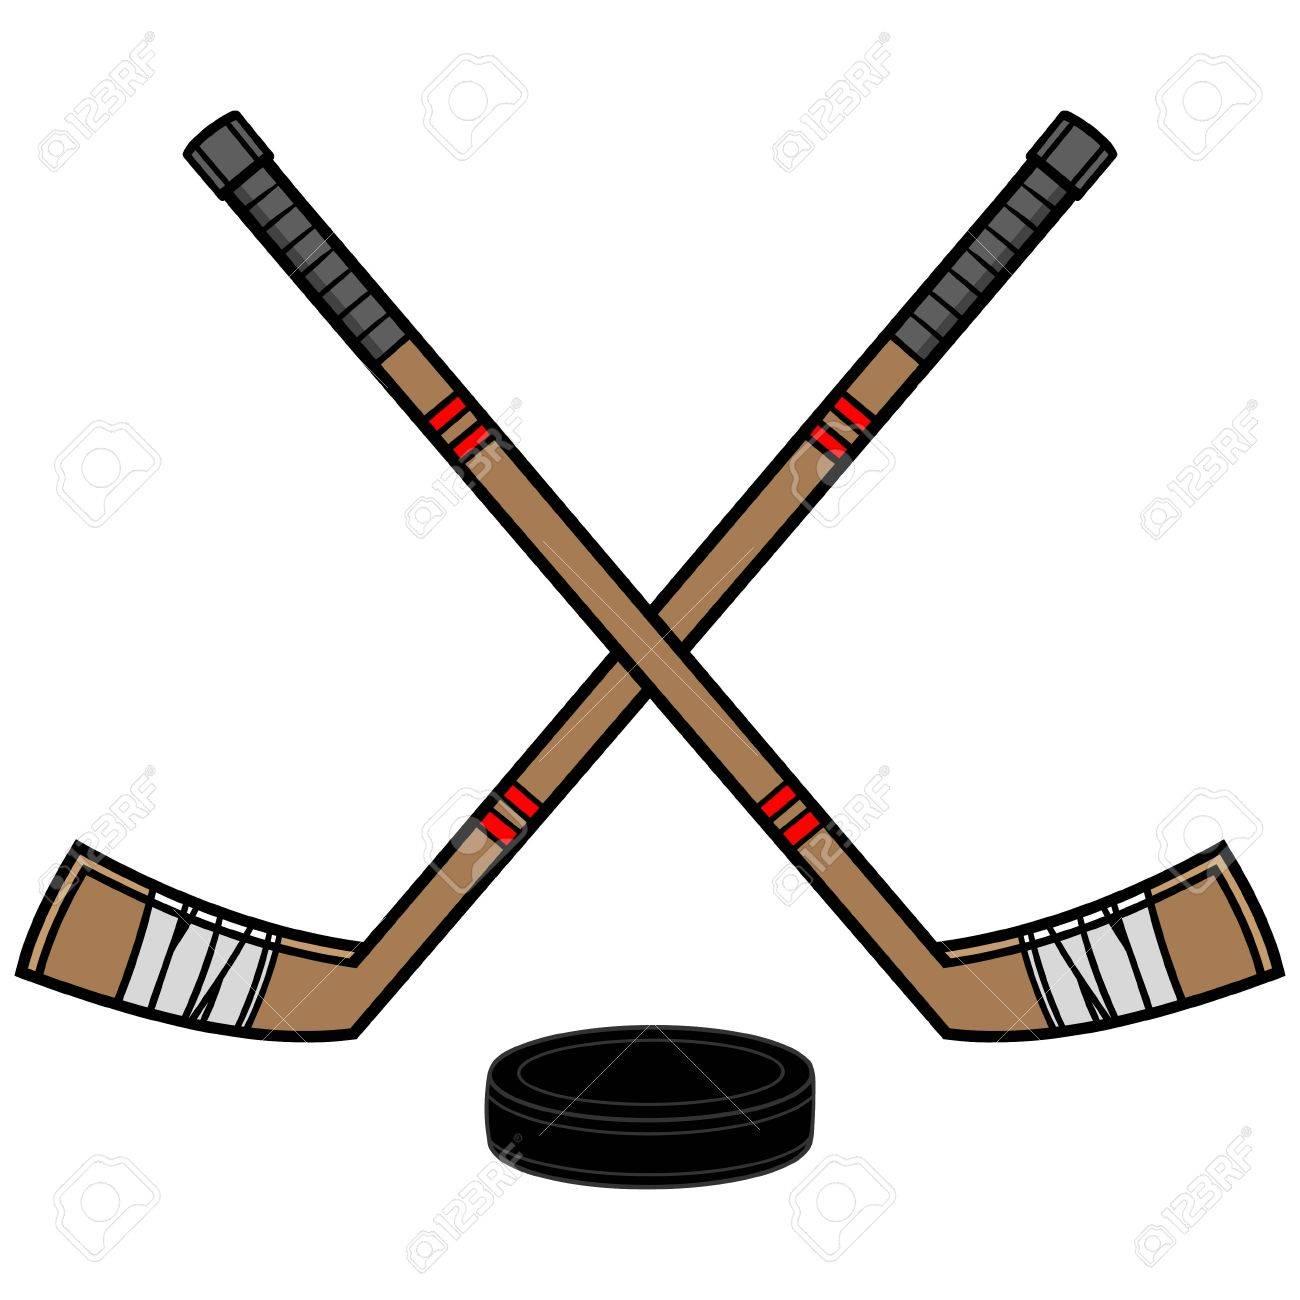 Hockey Sticks and Puck.